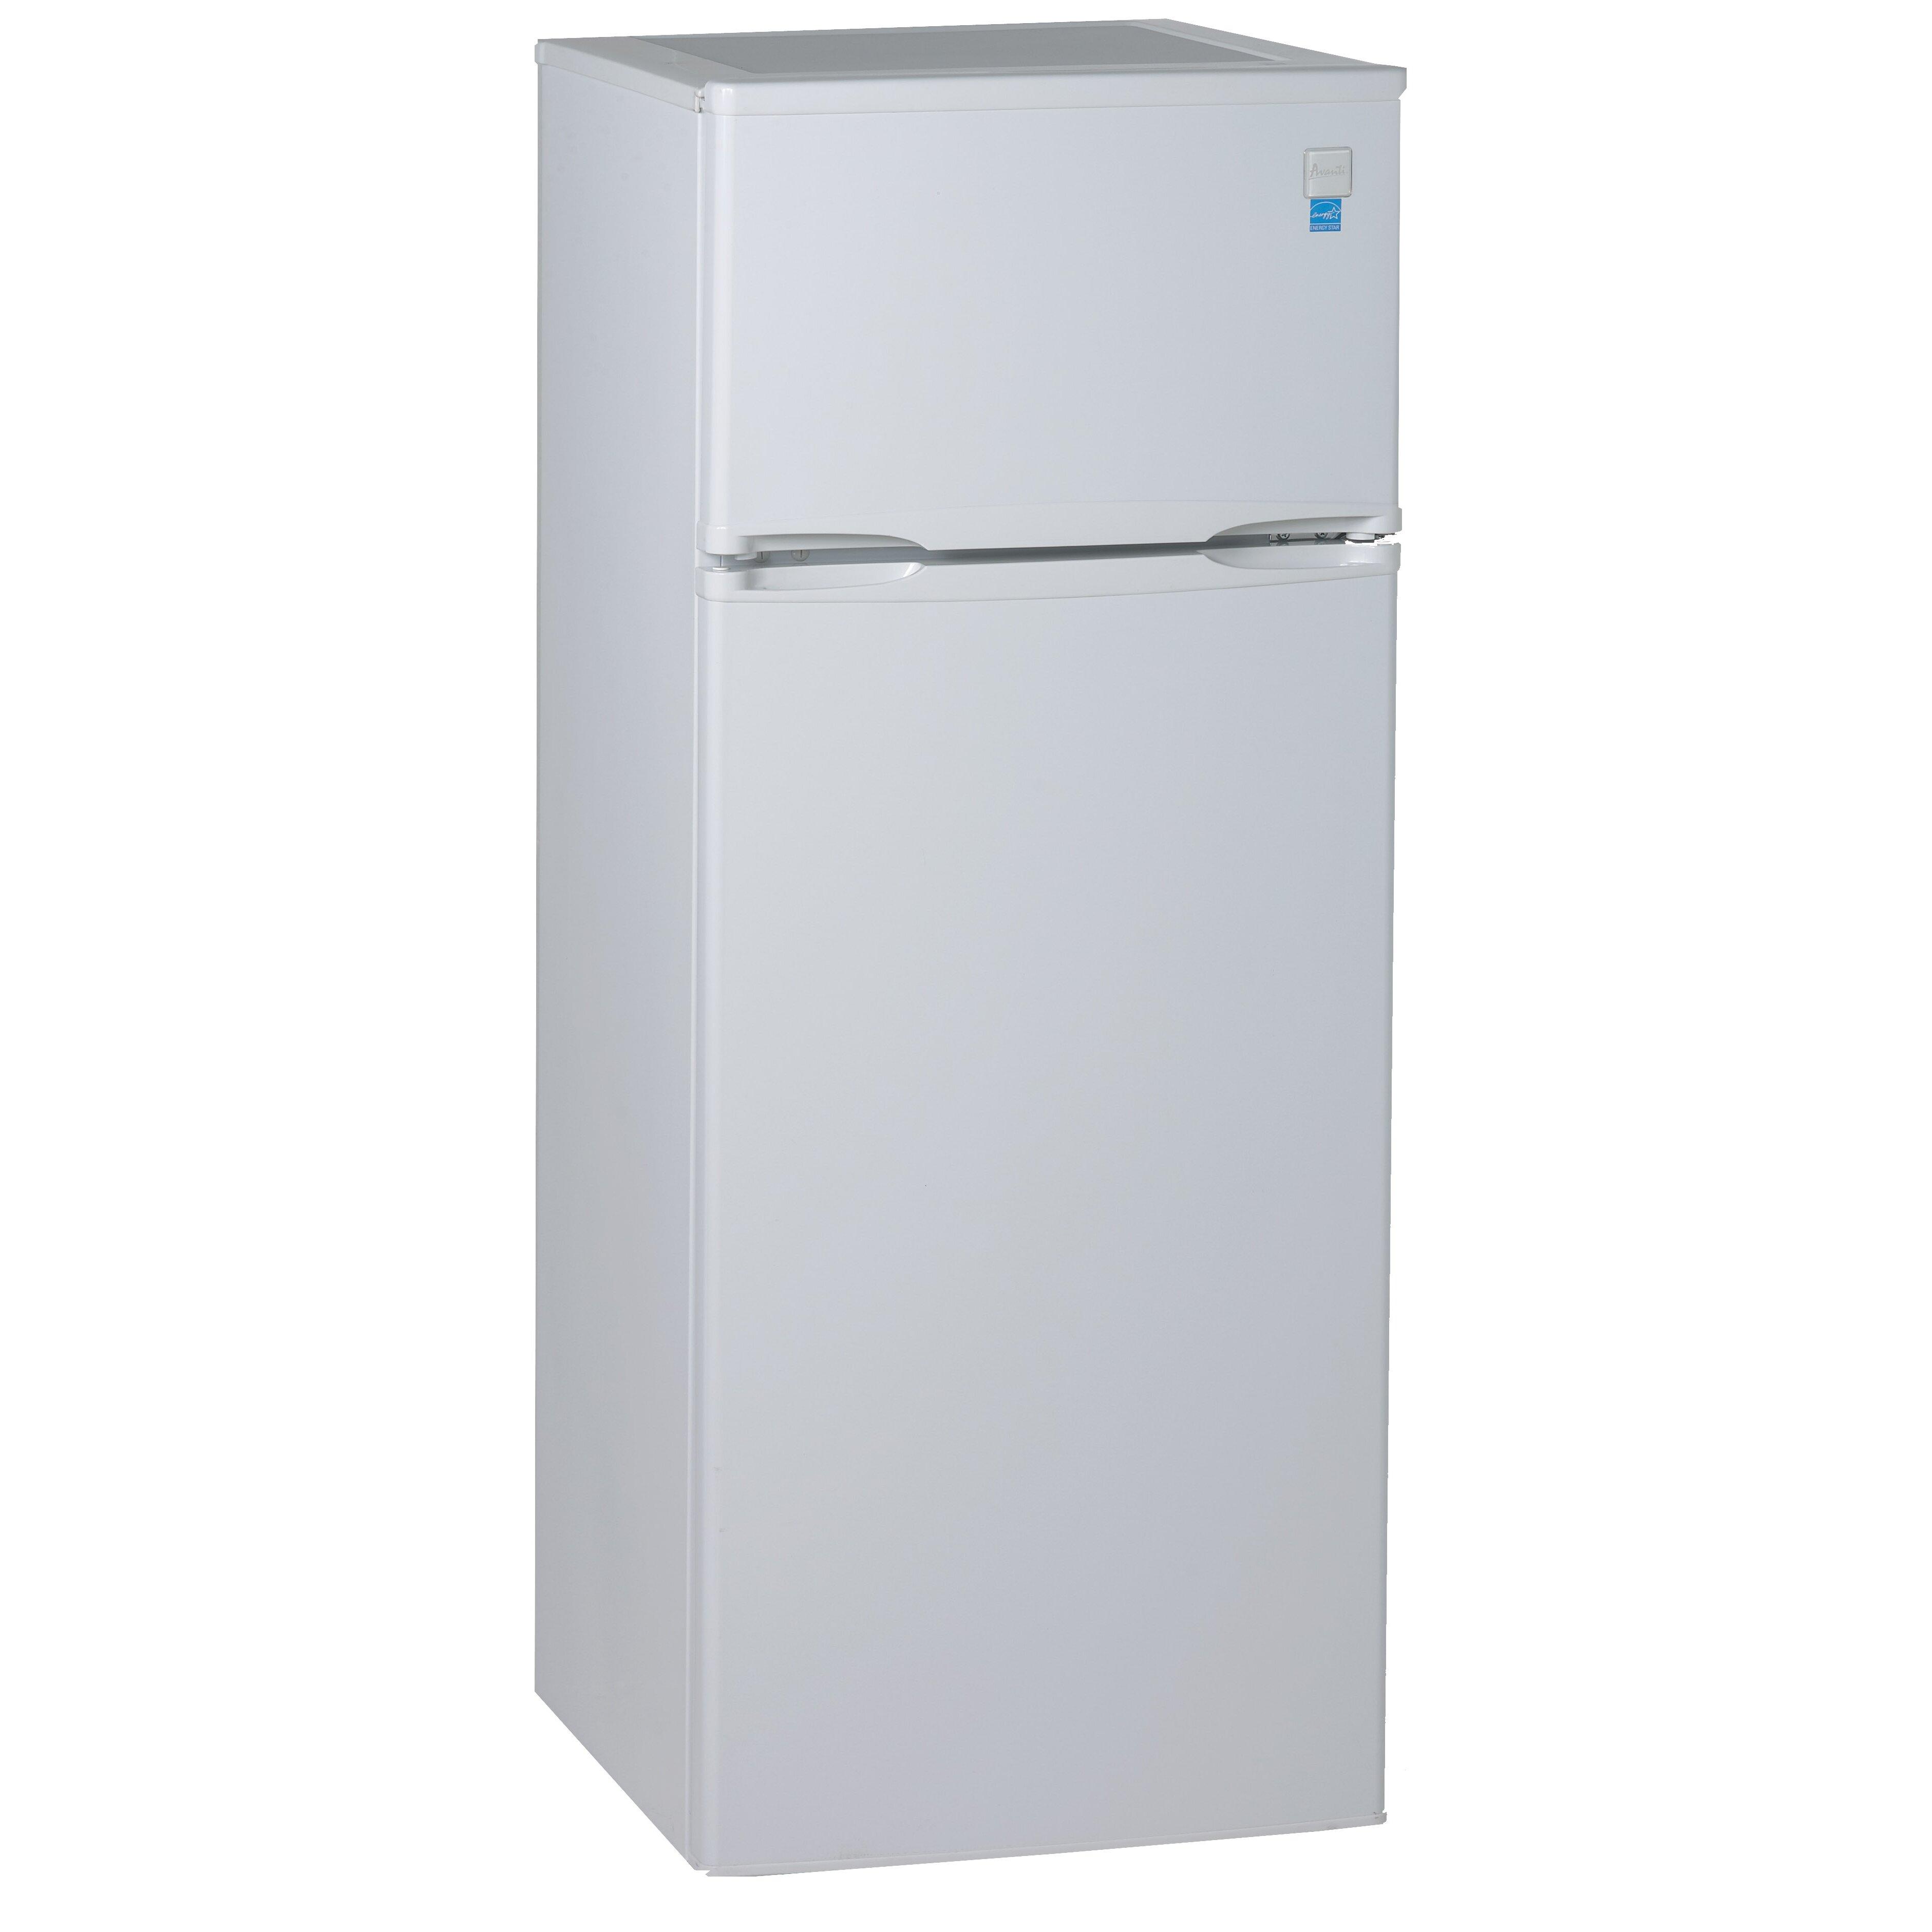 avanti 7 4 cu ft compact refrigerator reviews wayfair. Black Bedroom Furniture Sets. Home Design Ideas